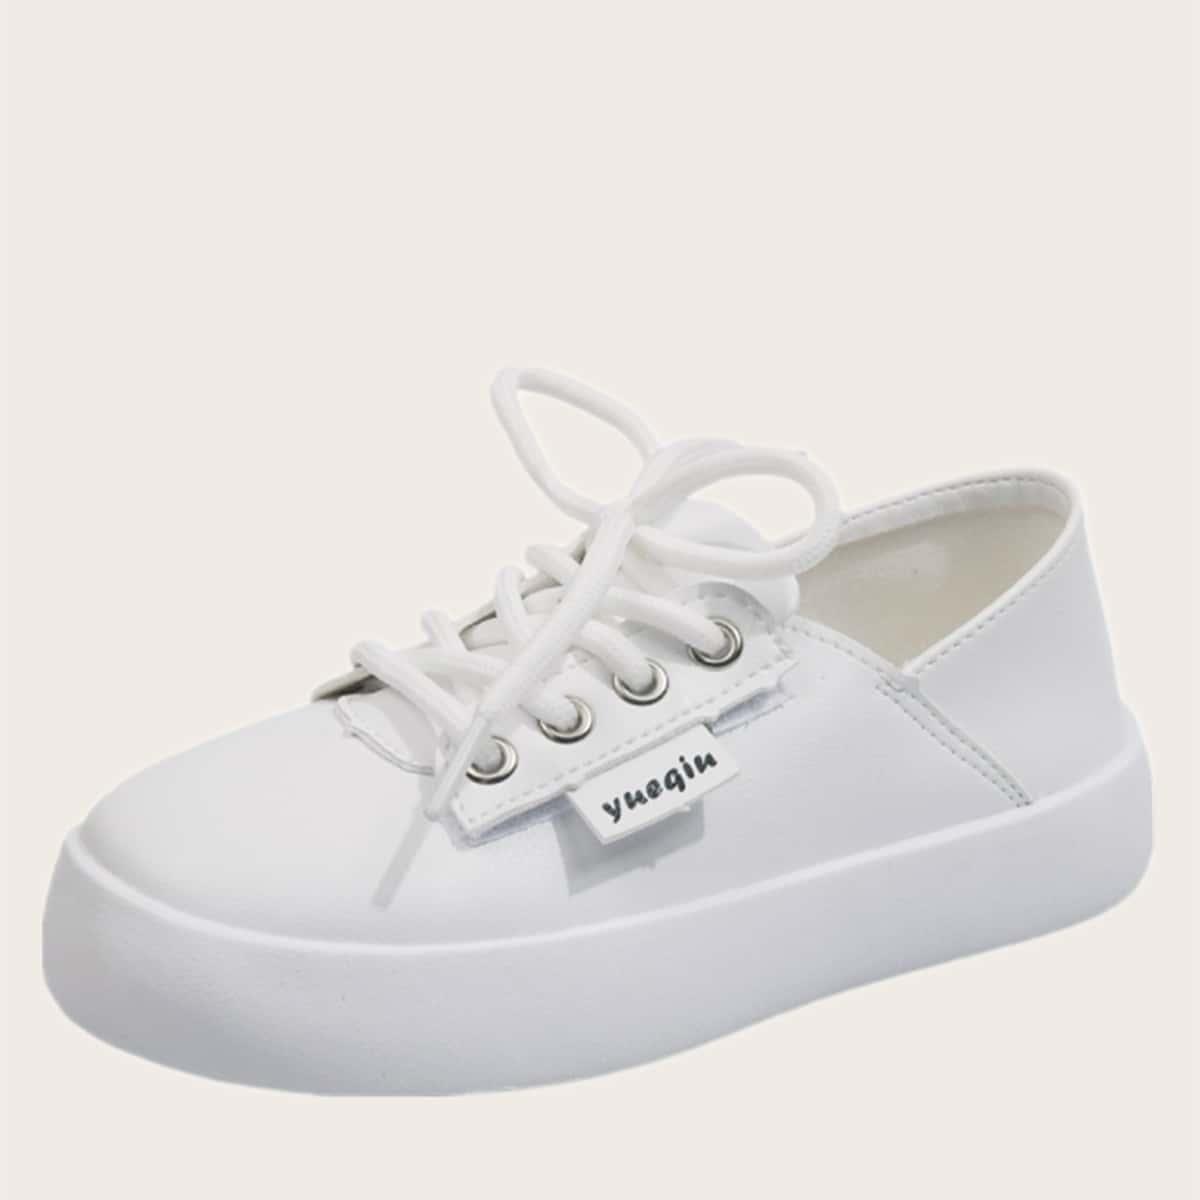 Минималистичная обувь на шнурке SheIn skshoes25210615214